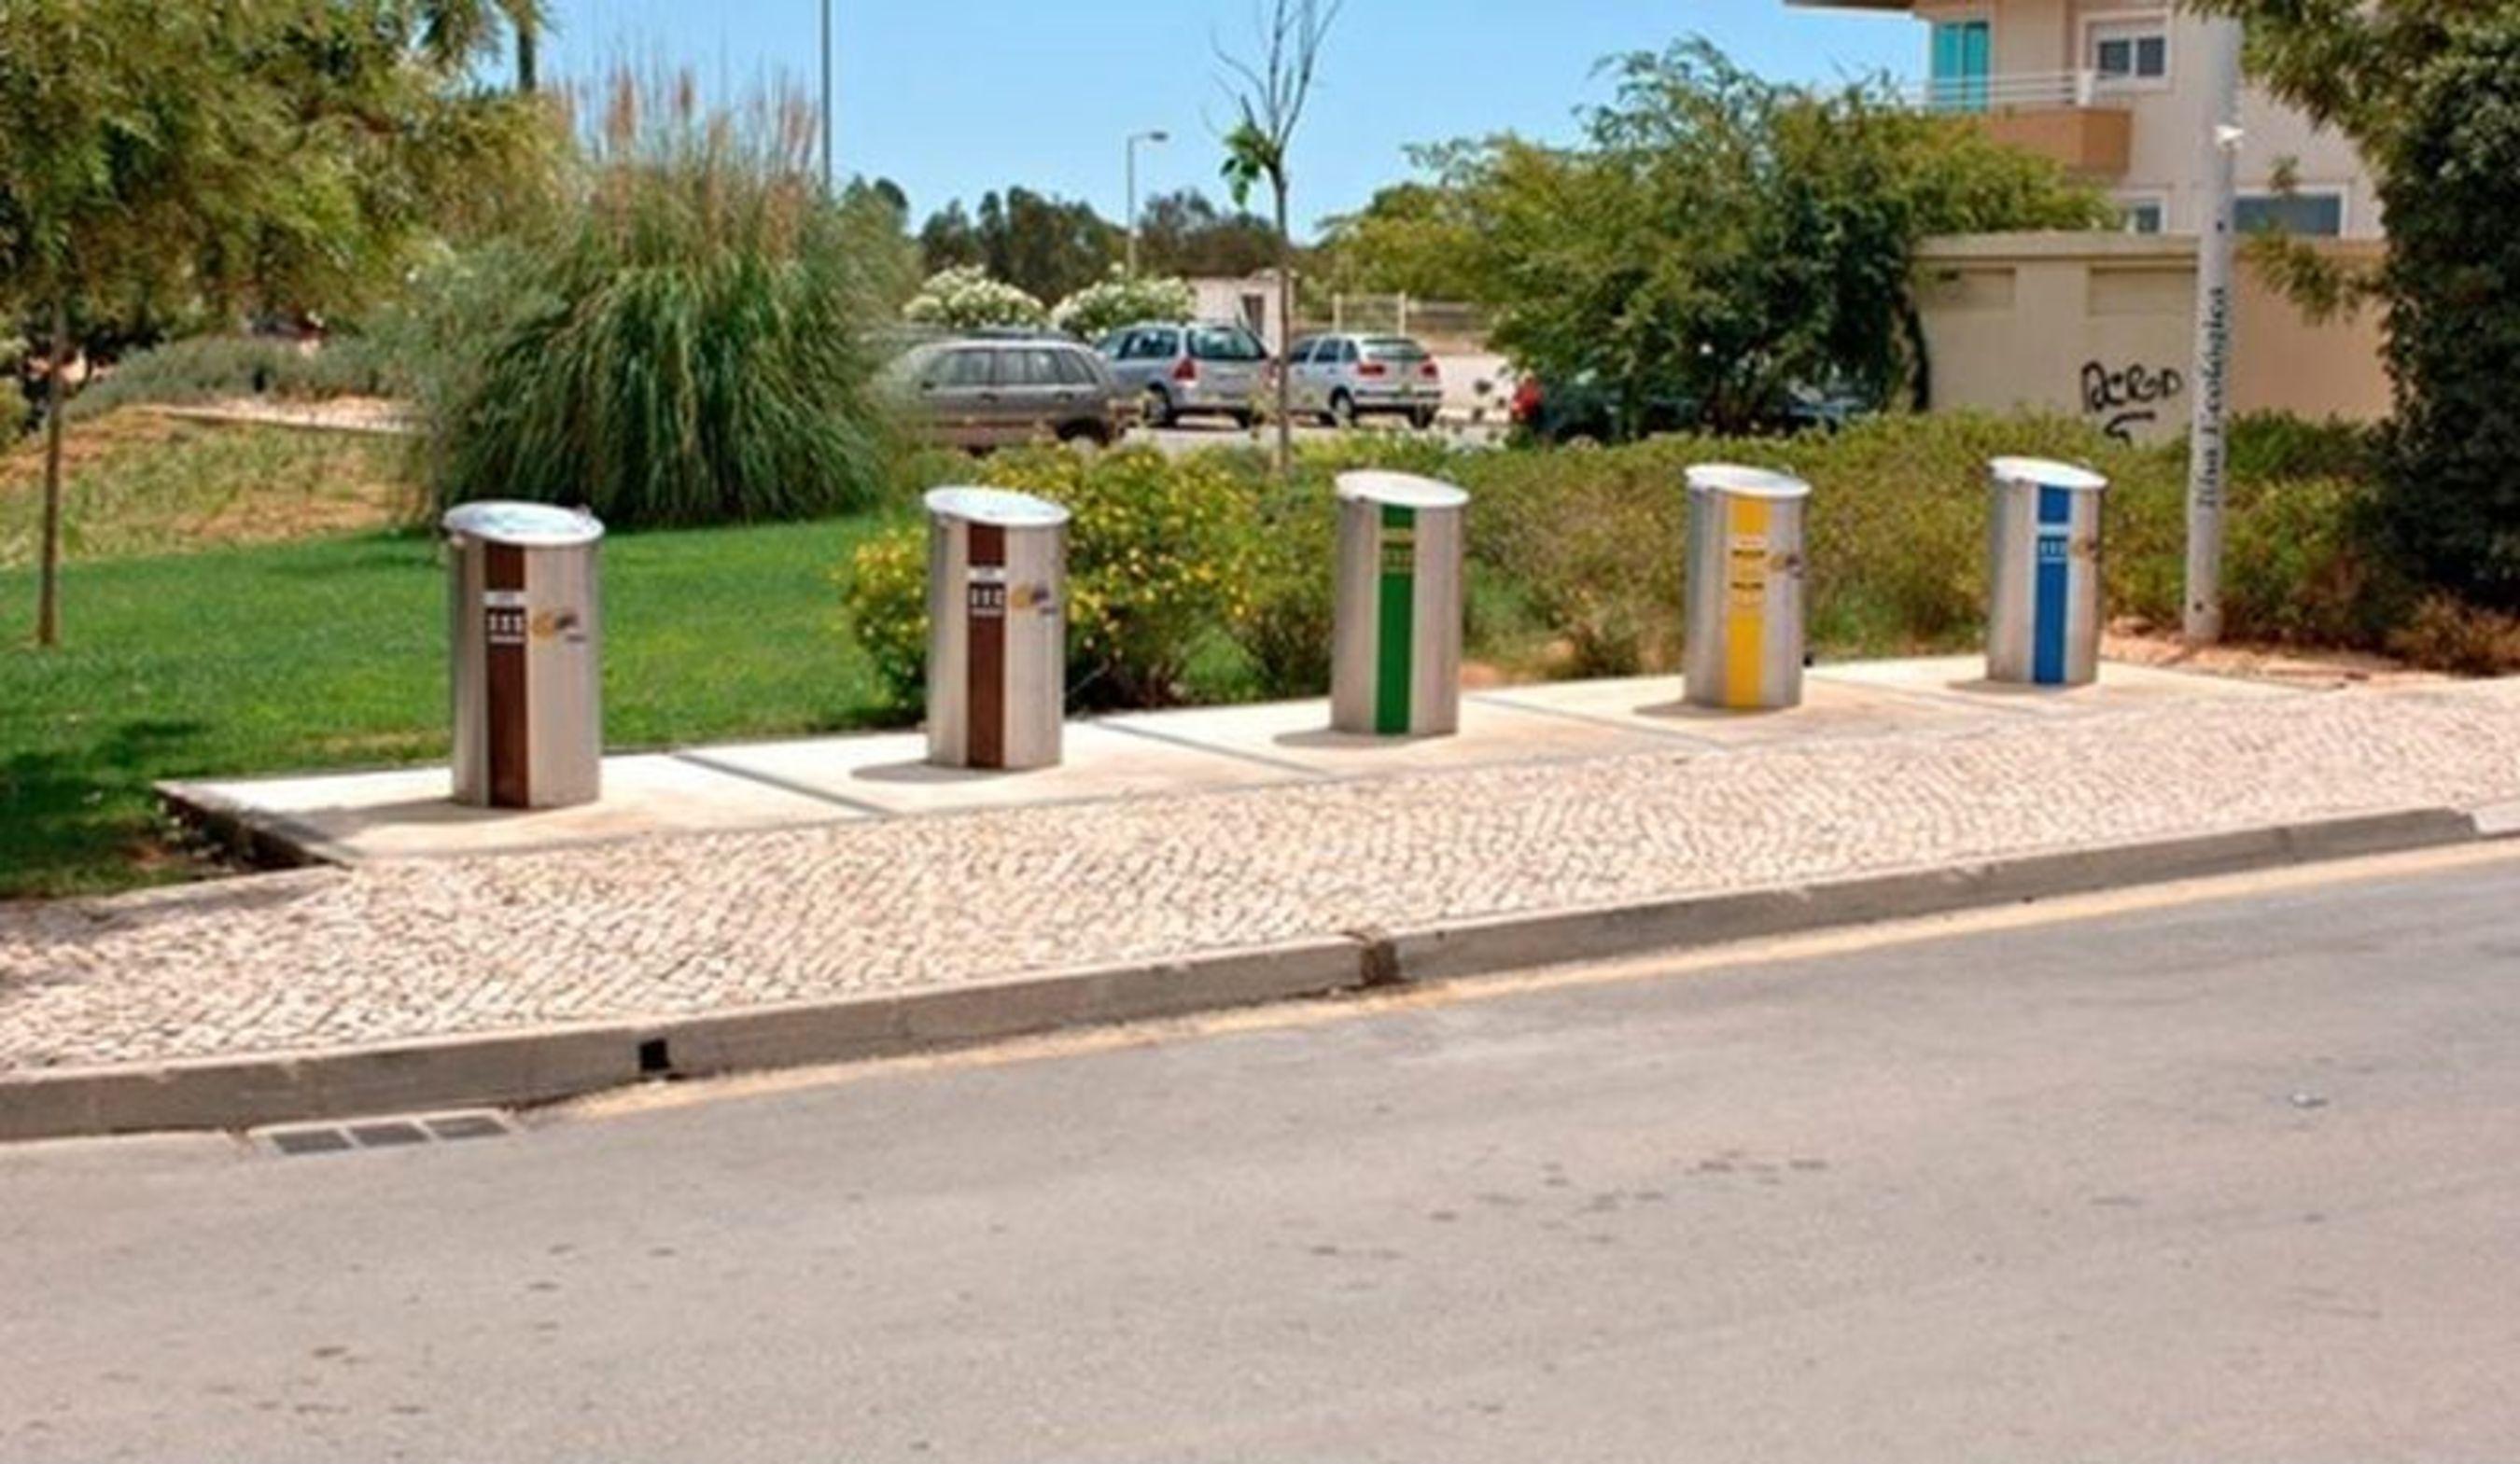 Portuguese Municipality Joins the SmartBin 'Internet of Bins' Revolution